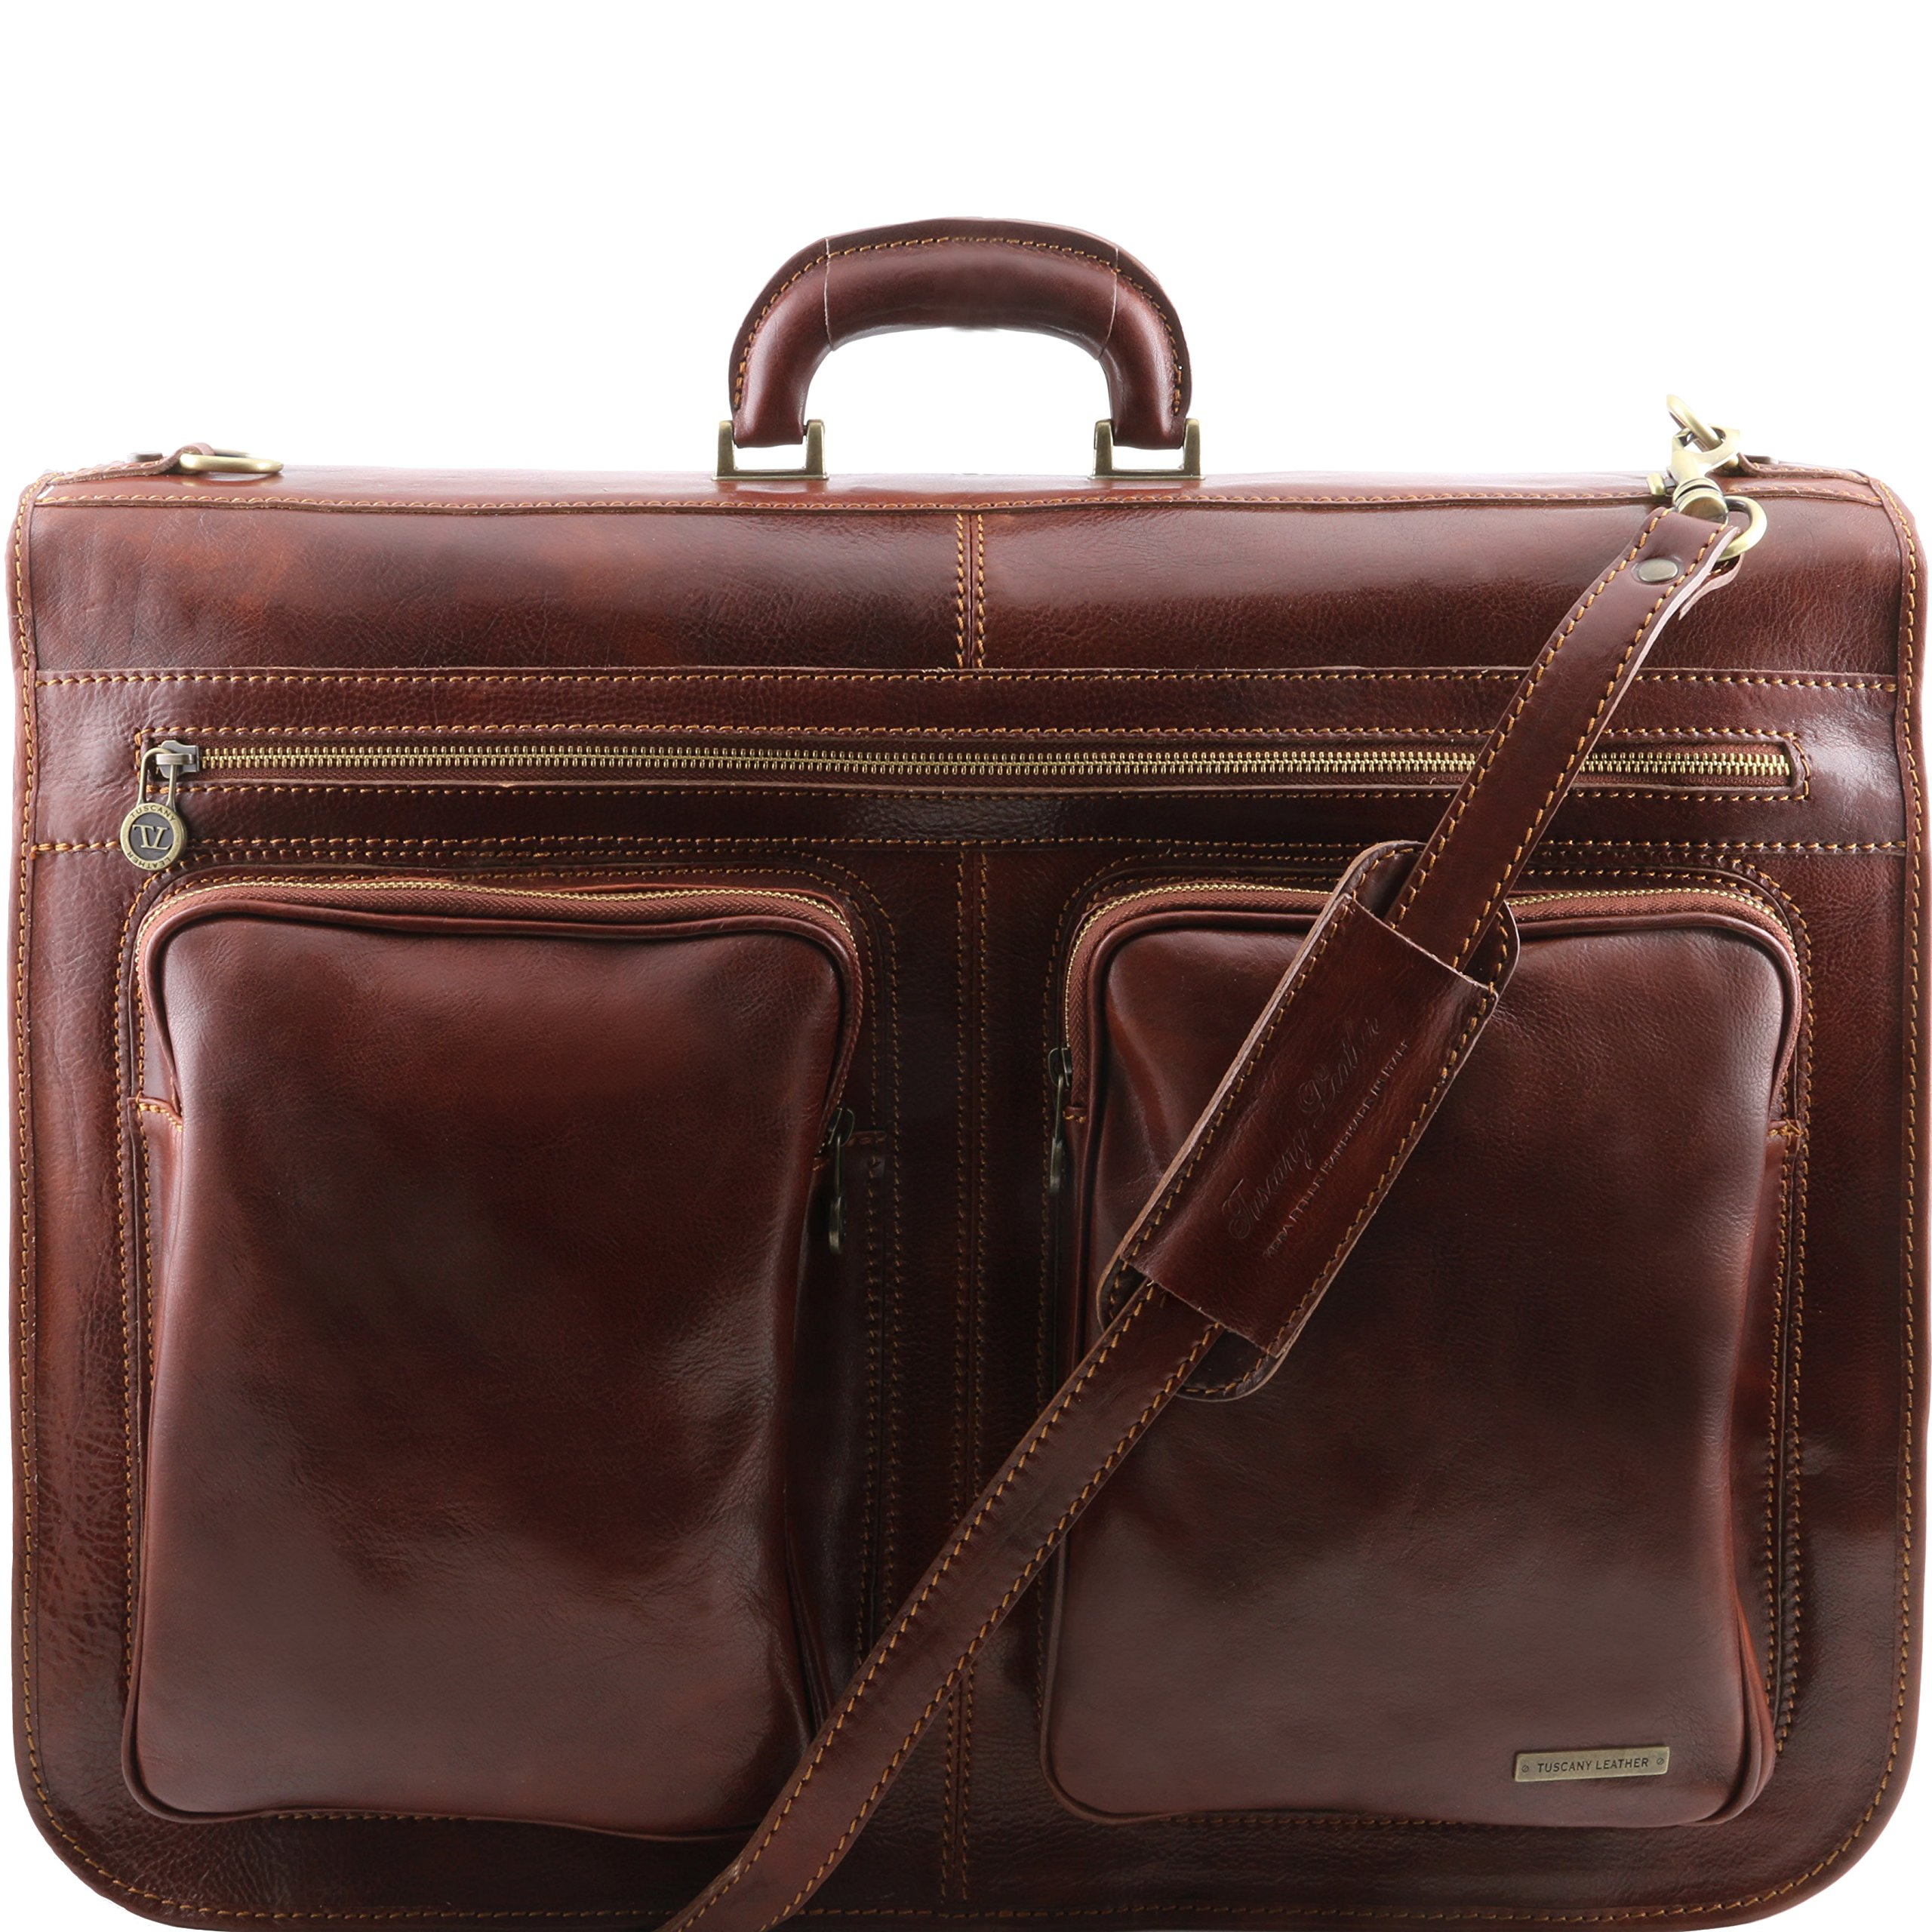 Tuscany Leather Tahiti Garment leather bag Brown